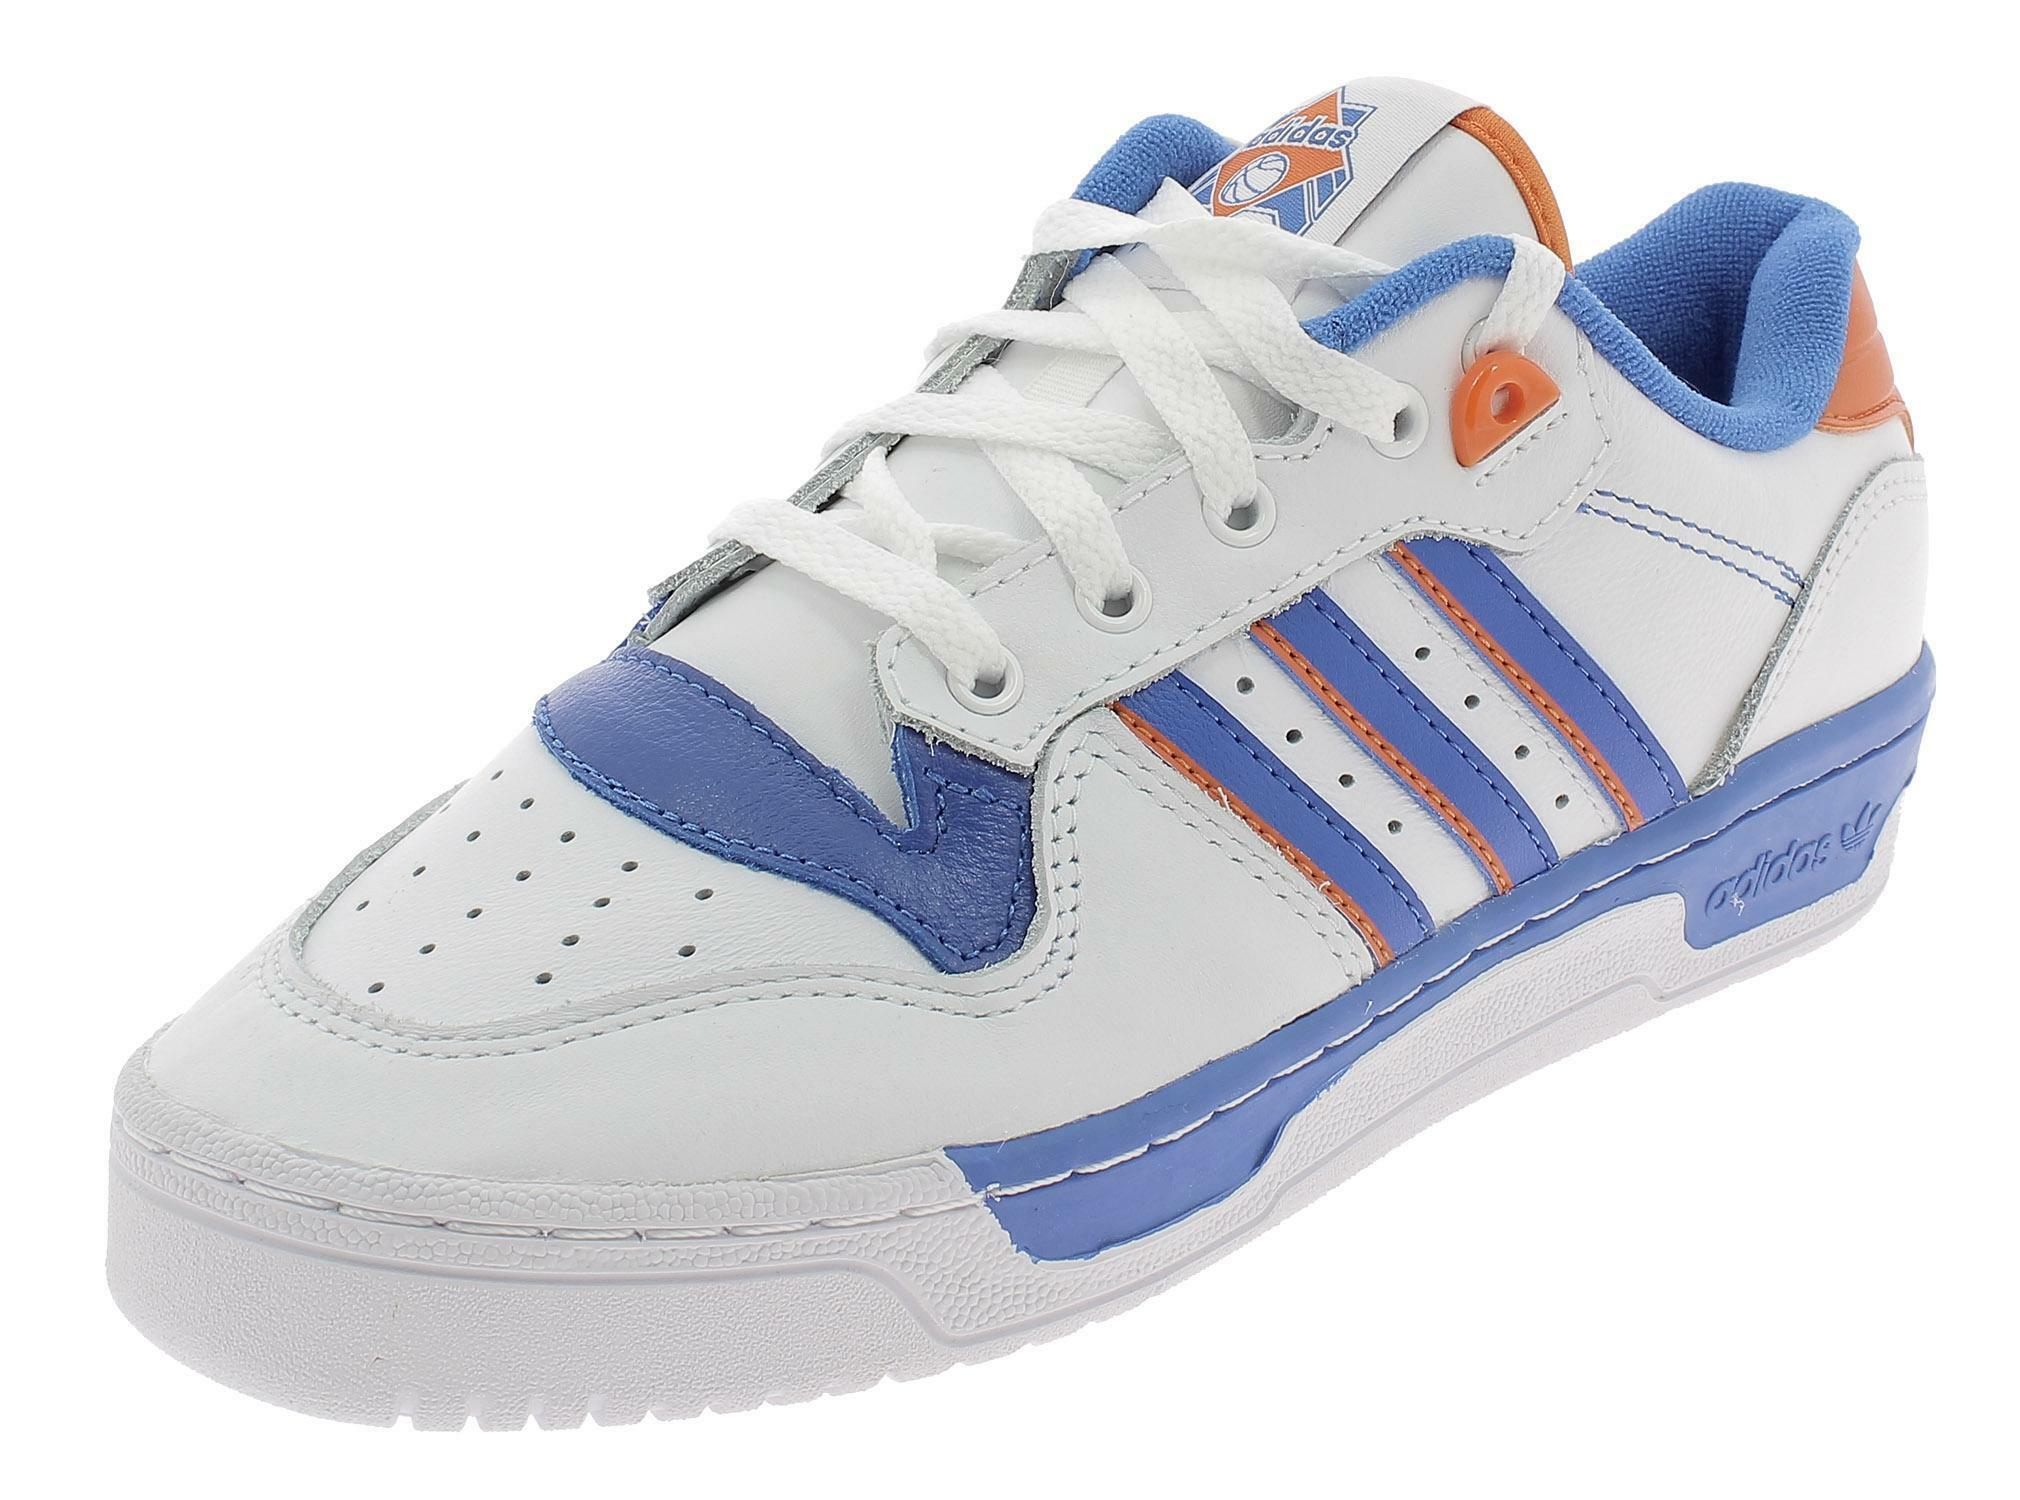 rice potato Apparently  Adidas rivalry low scarpe sportive uomo bianche fu6833